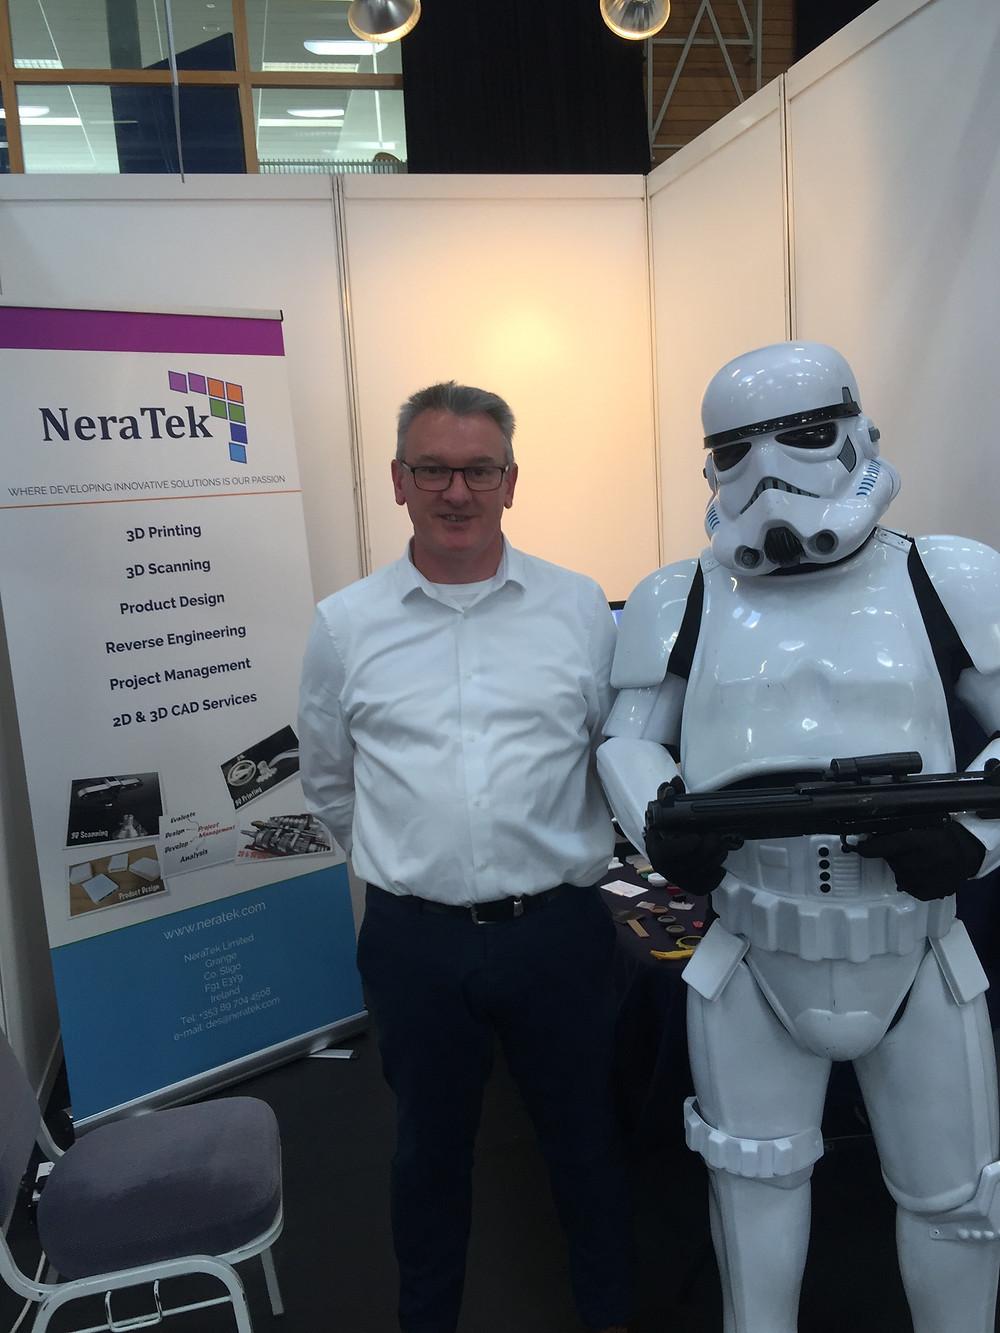 NeraTek Engineering Expo 2017